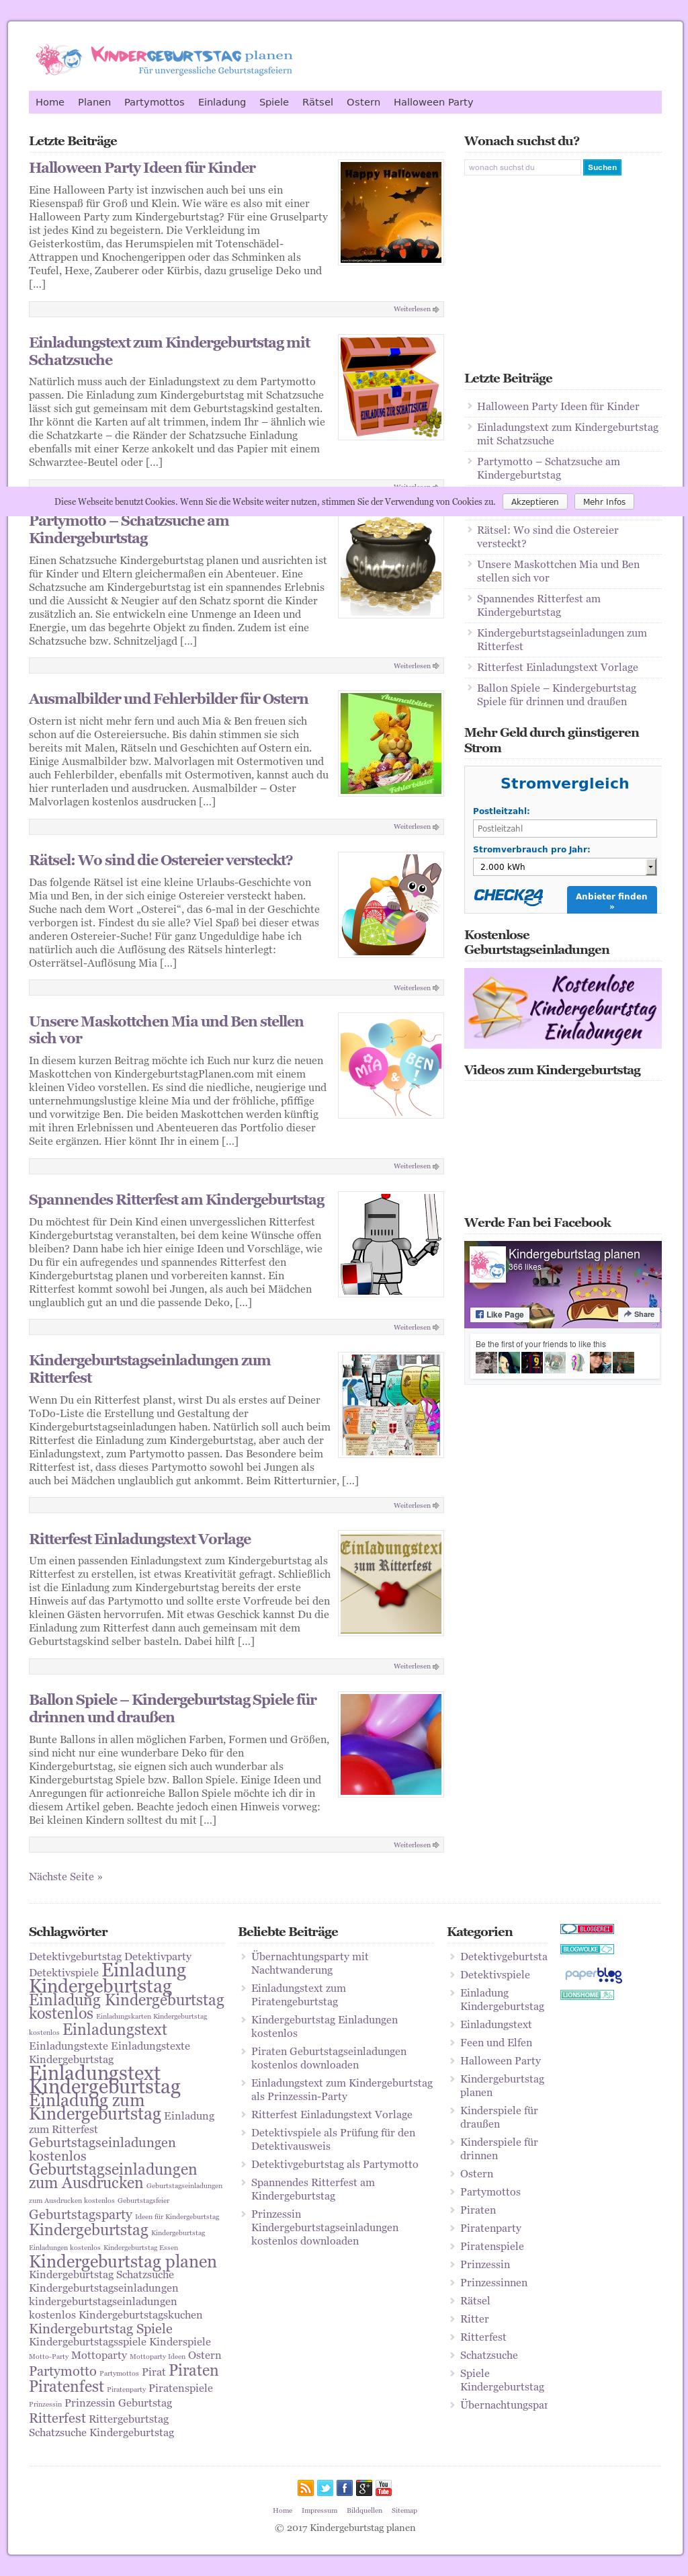 Kindergeburtstag Planen Competitors Revenue And Employees